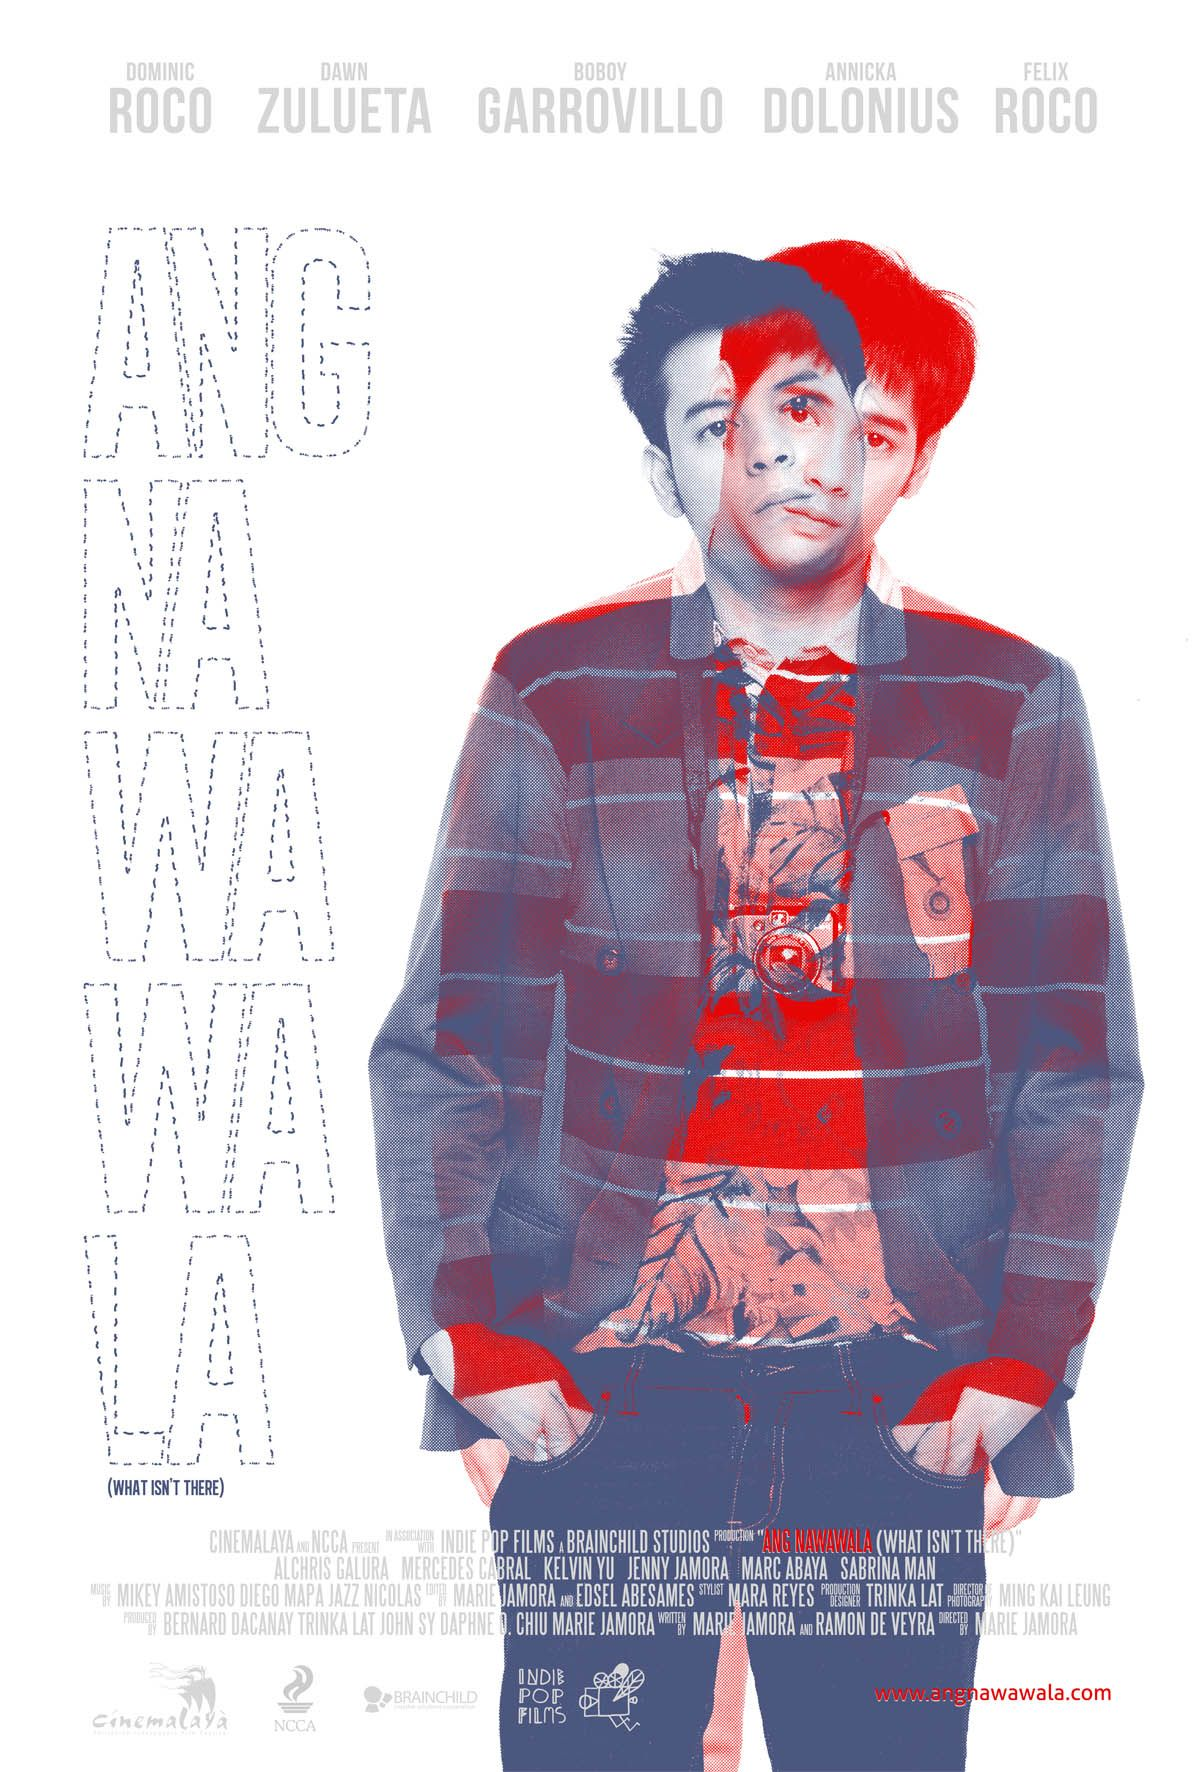 Ang Nawawala A Marie Jamora feature film Indie films